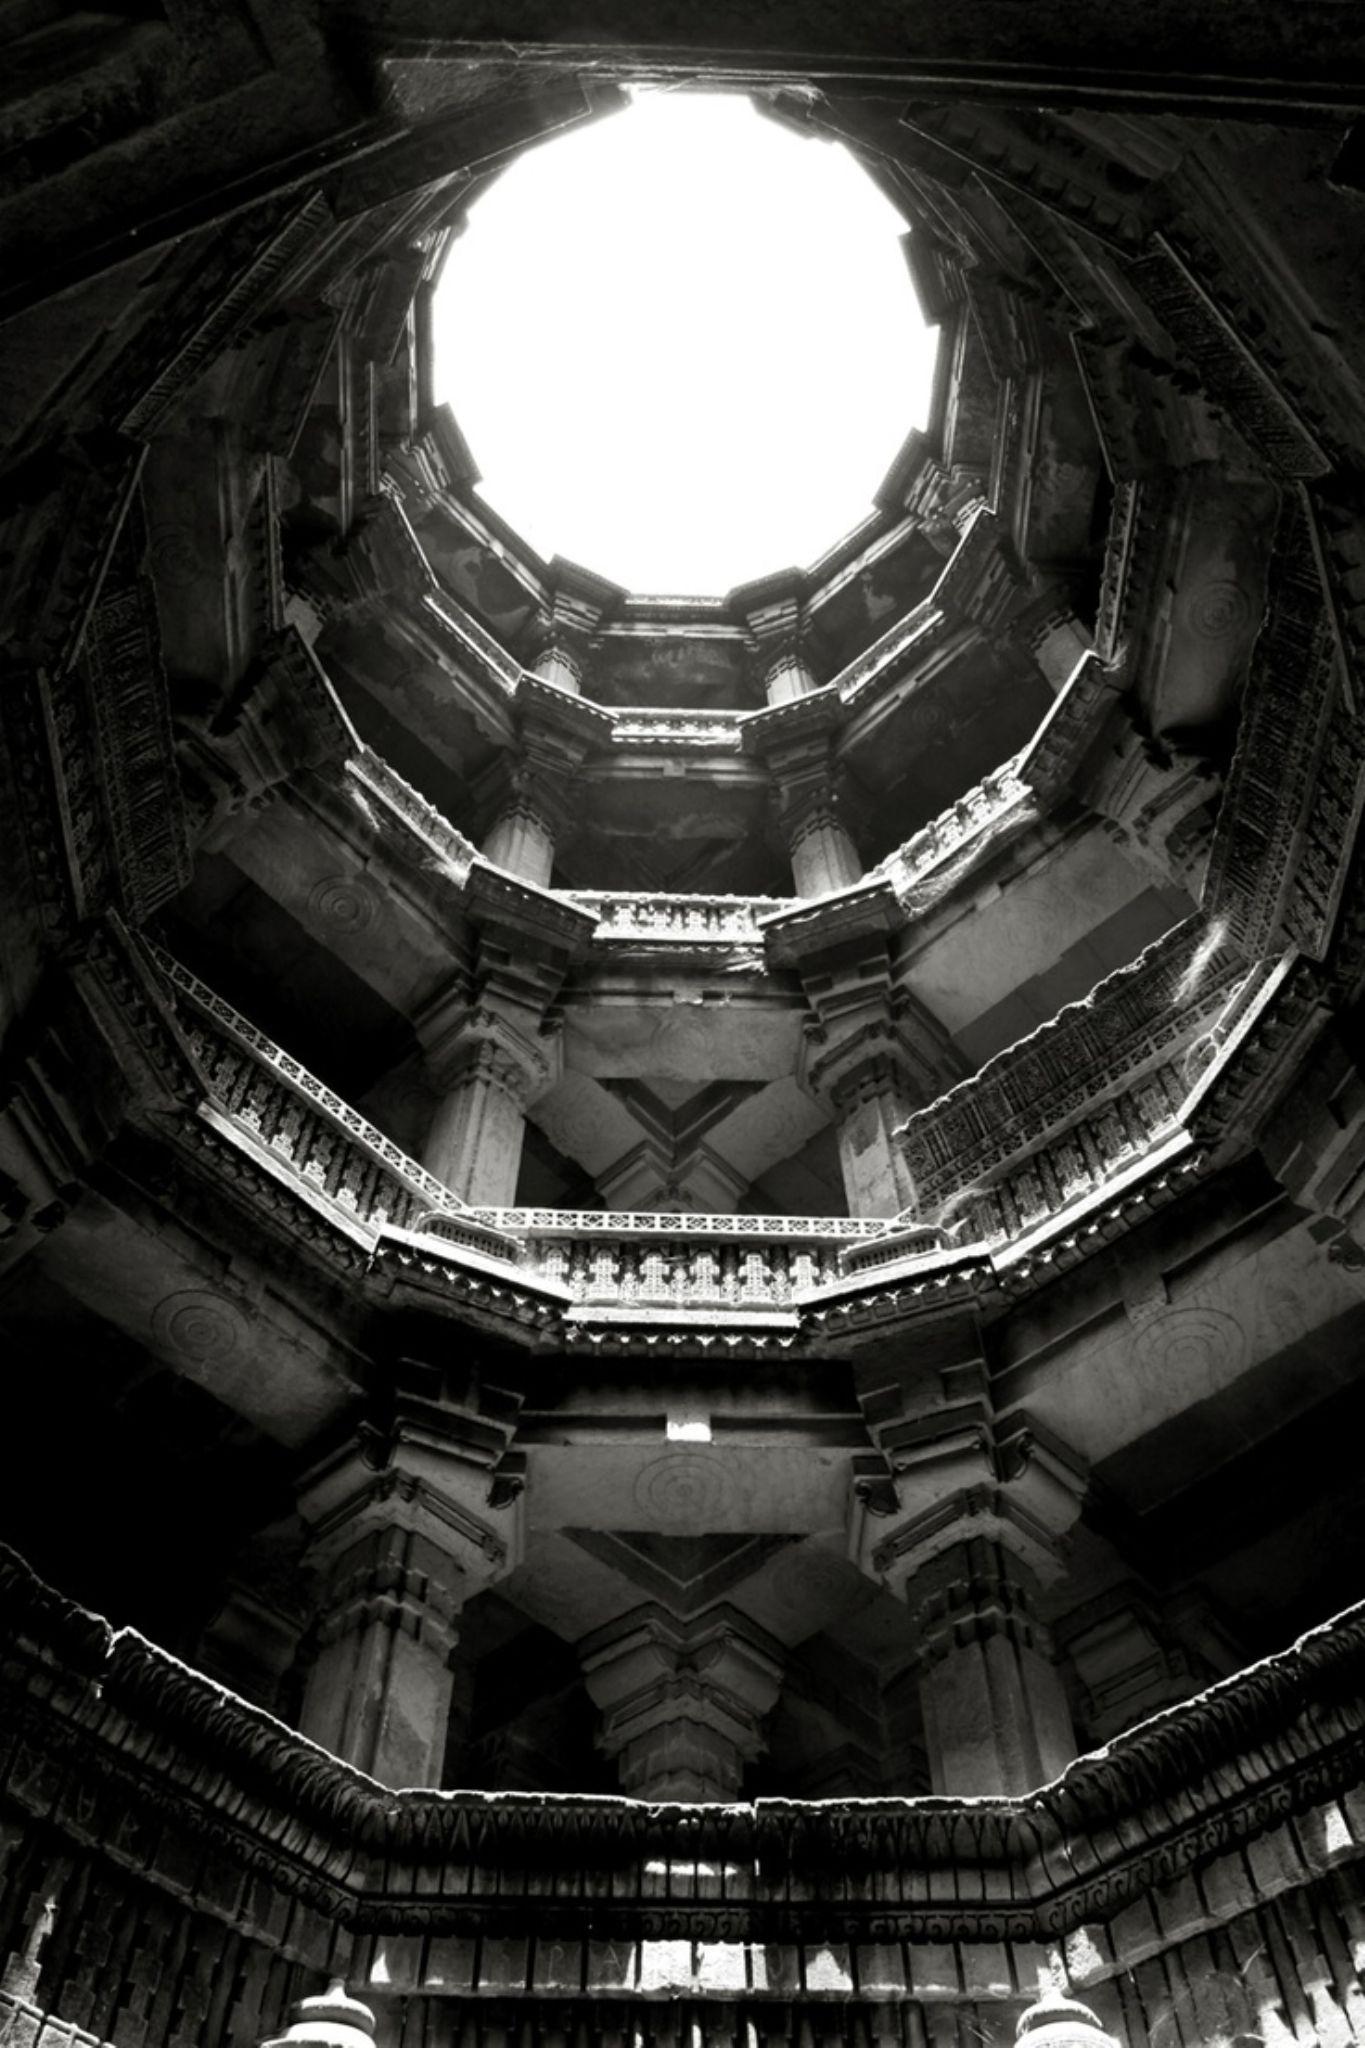 Archaeological photography - Mangos Mediacom by Mangoes Mediacom